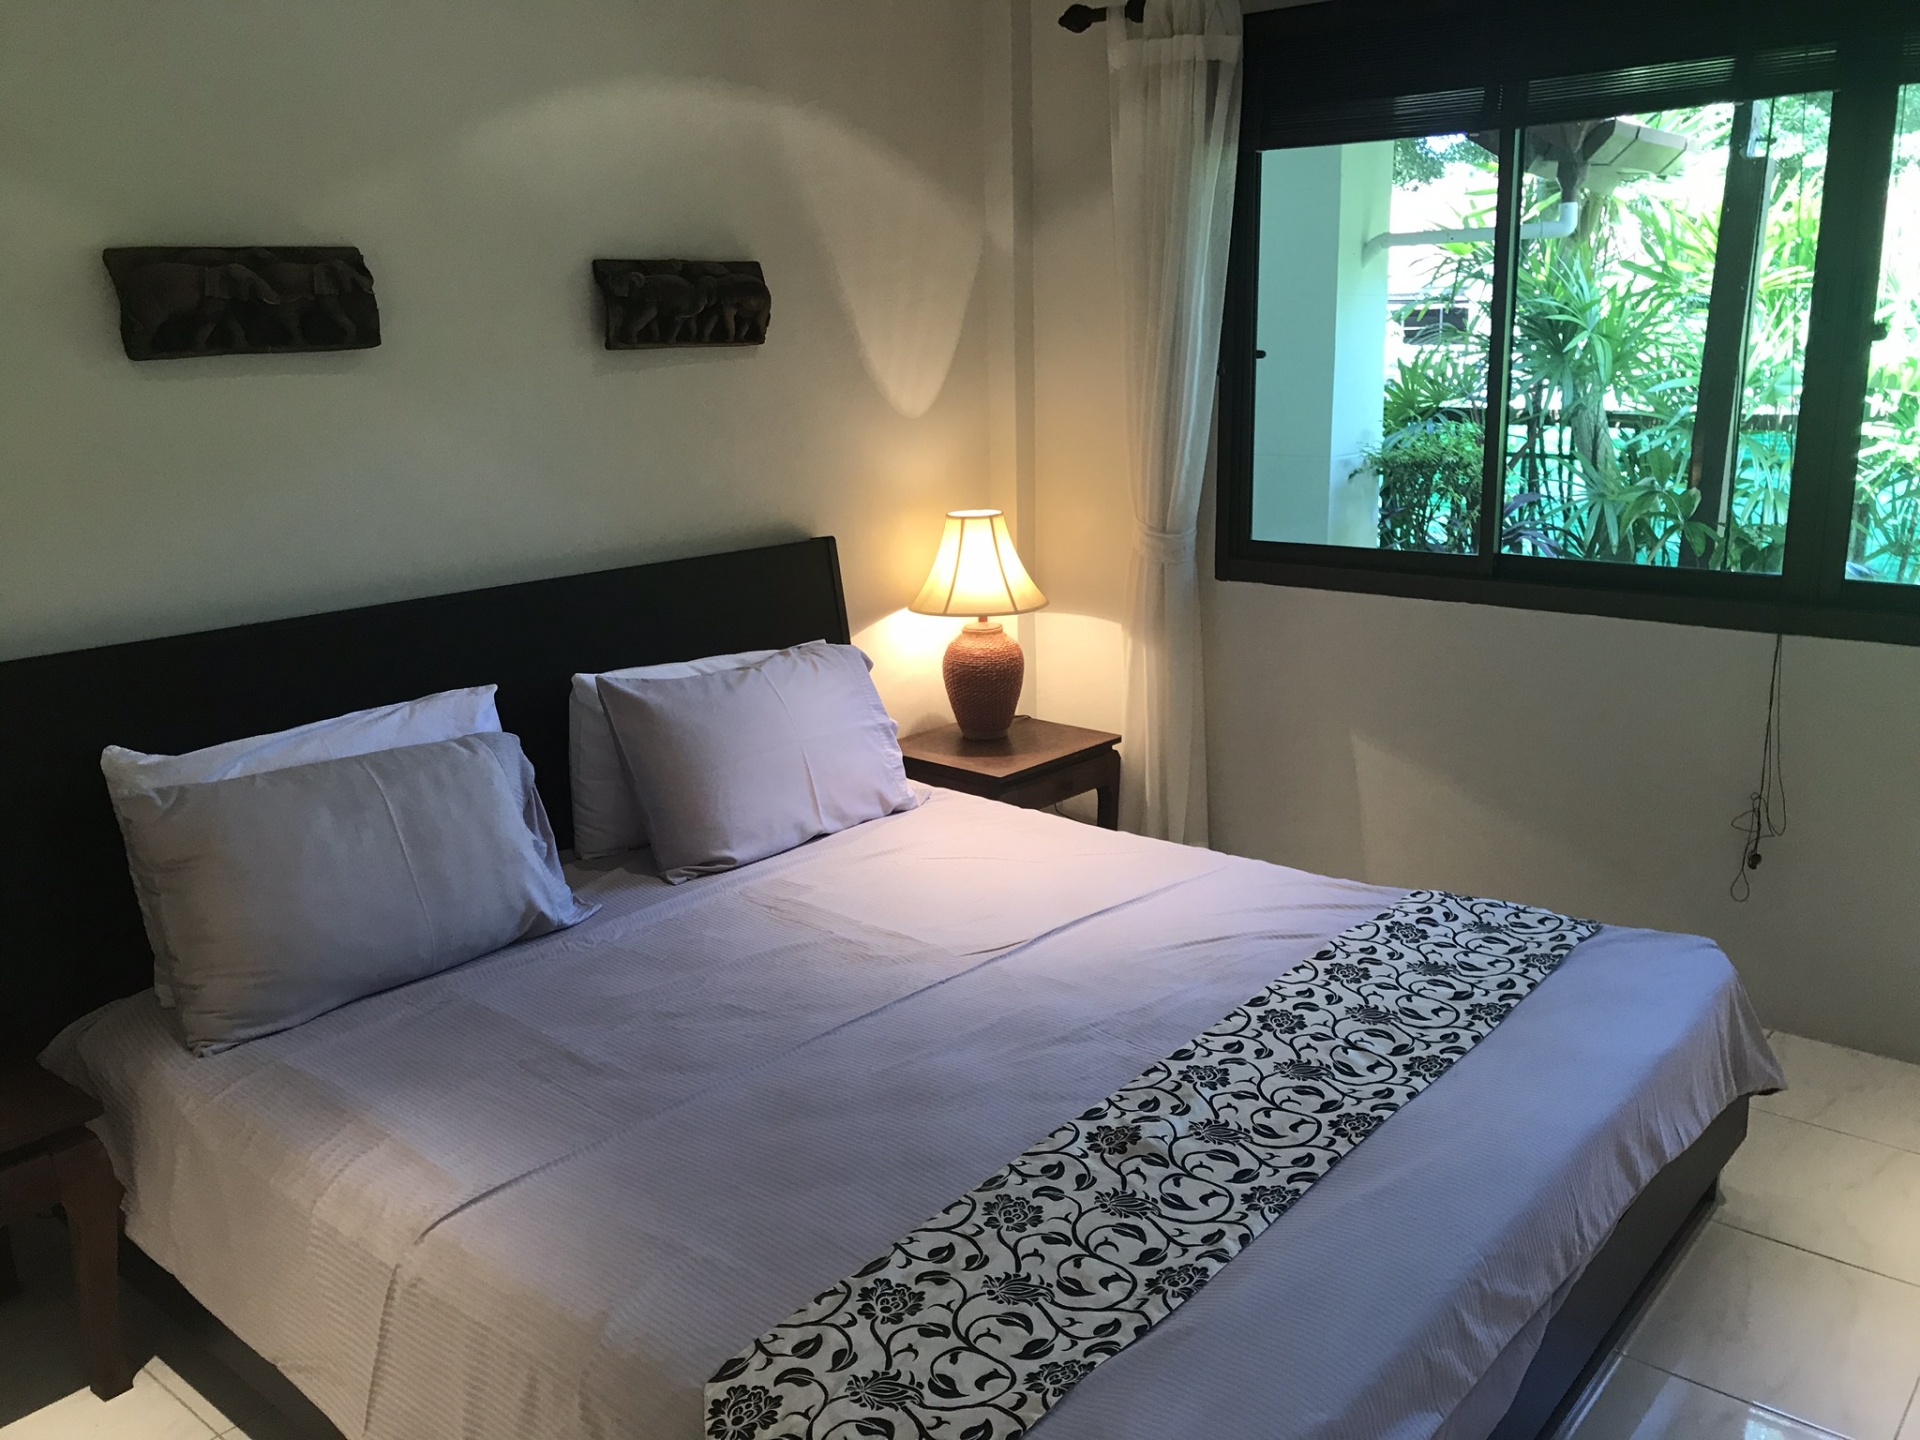 3 Bedroom House near Blue Canyon-IMG_0150.JPG